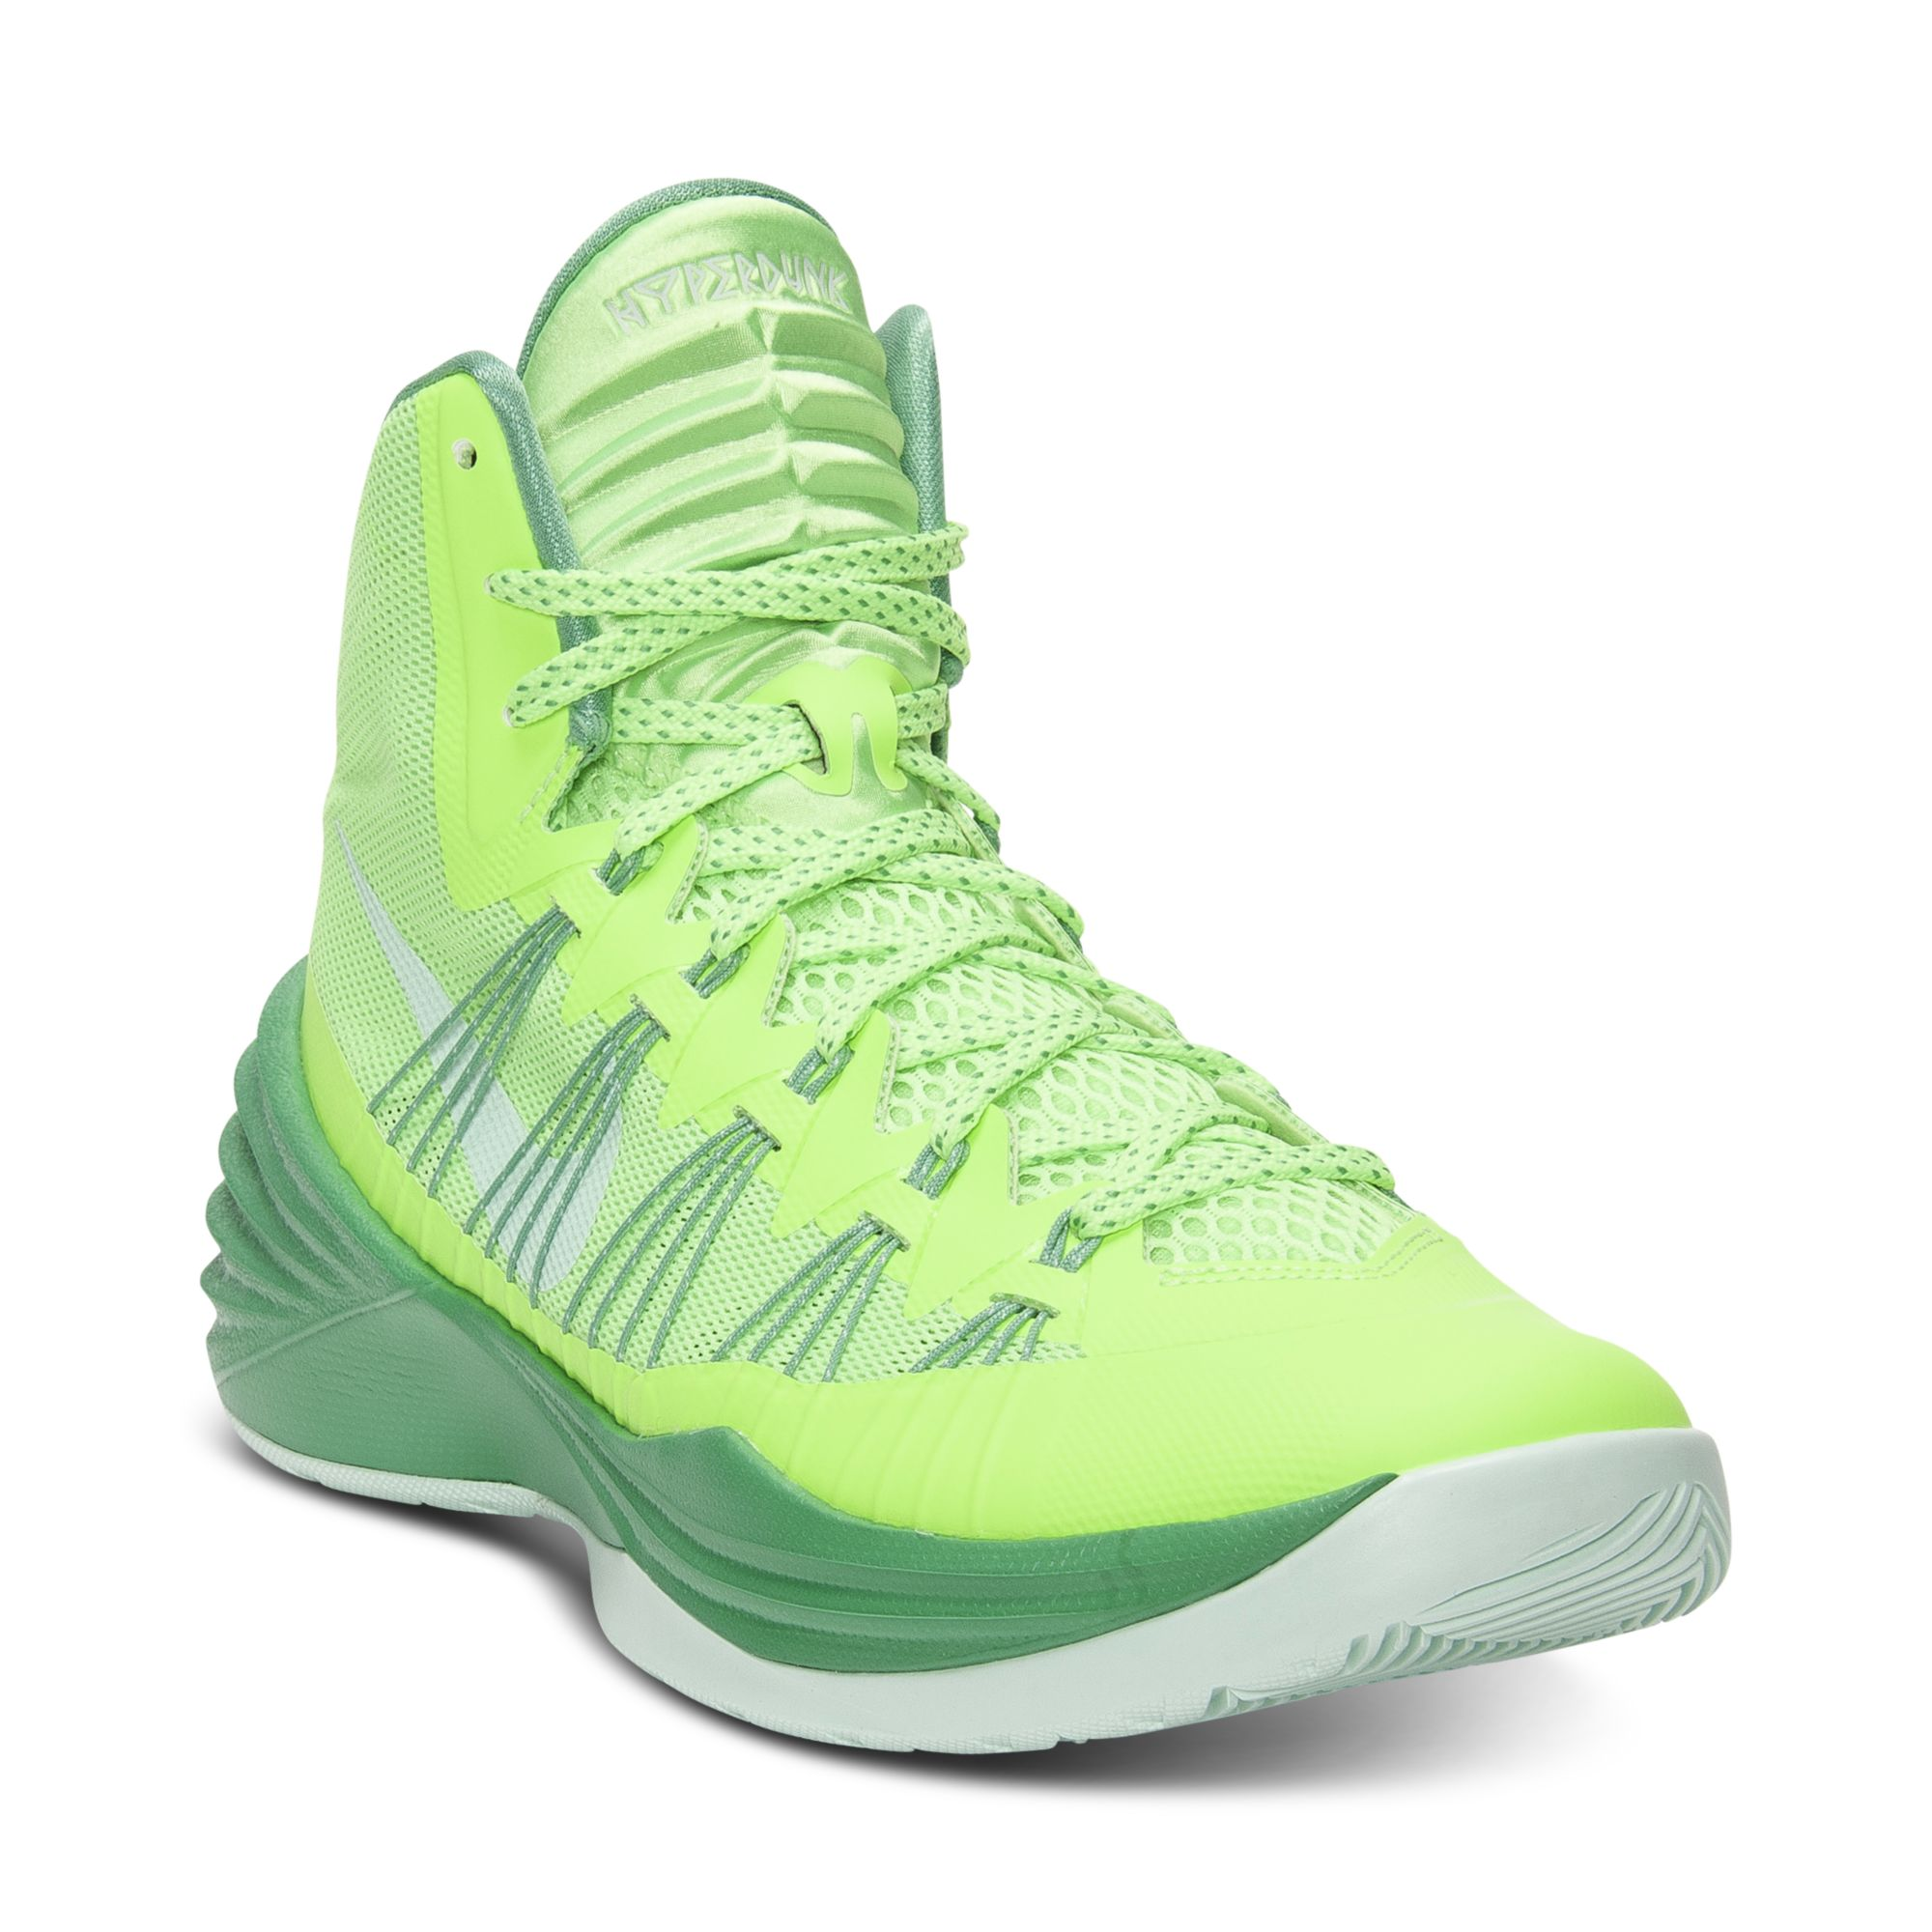 promo code 9af44 8832b Nike Hyperdunk Basketball Sneakers in Green for Men - Lyst